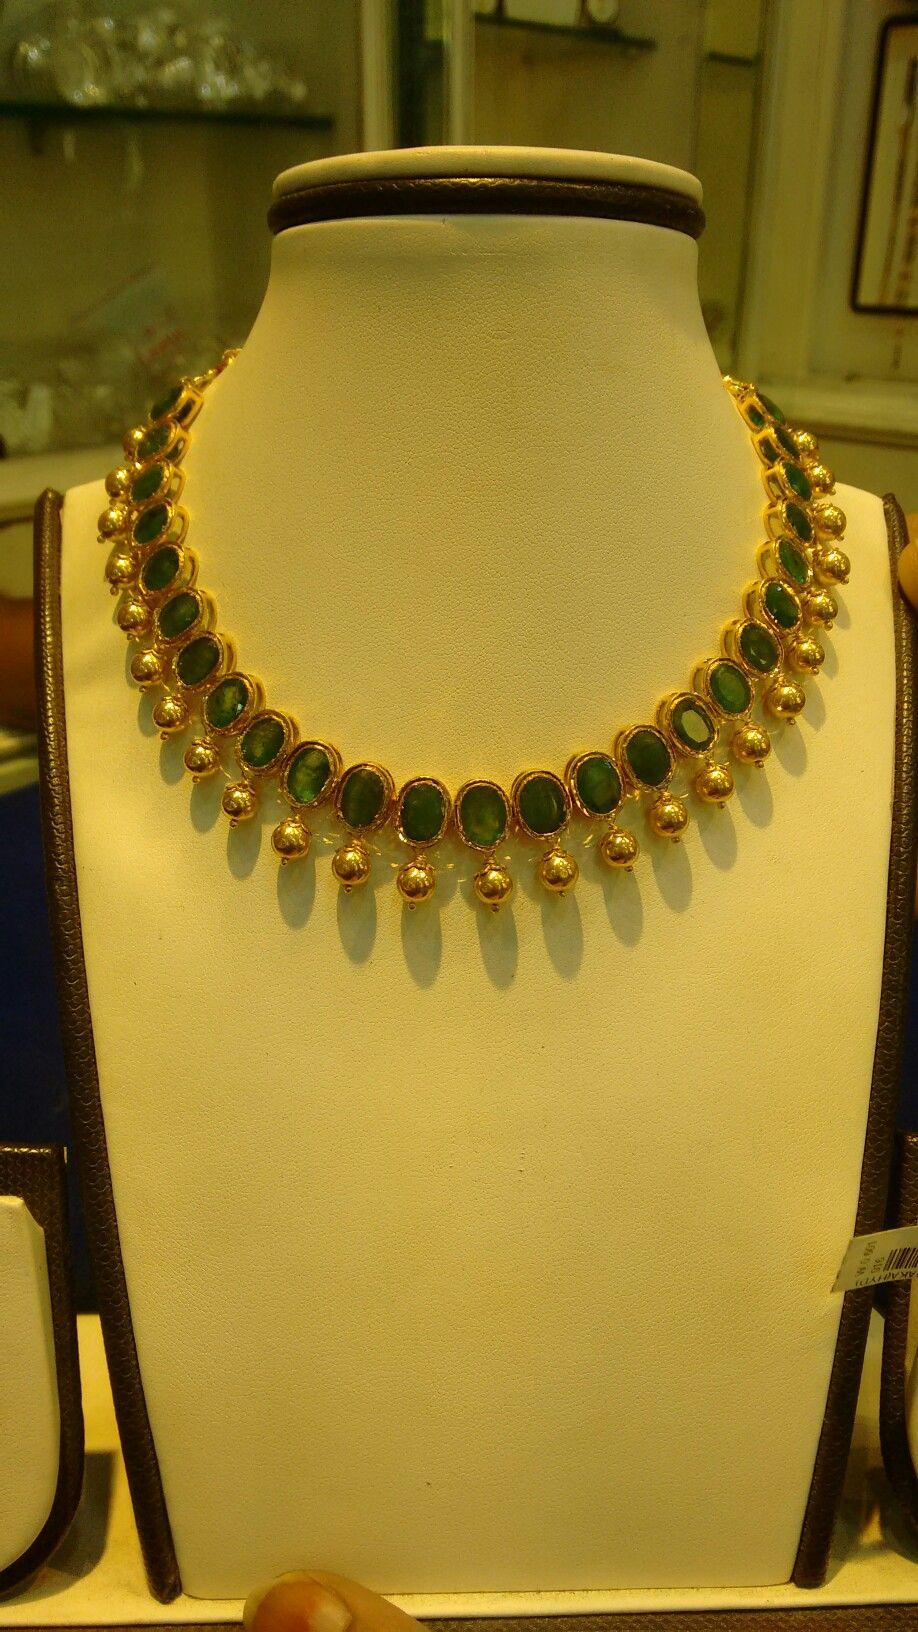 70b9036c9f694 emeralds | Ornaments in 2019 | Jewelry, Emerald jewelry, Gold jewelry